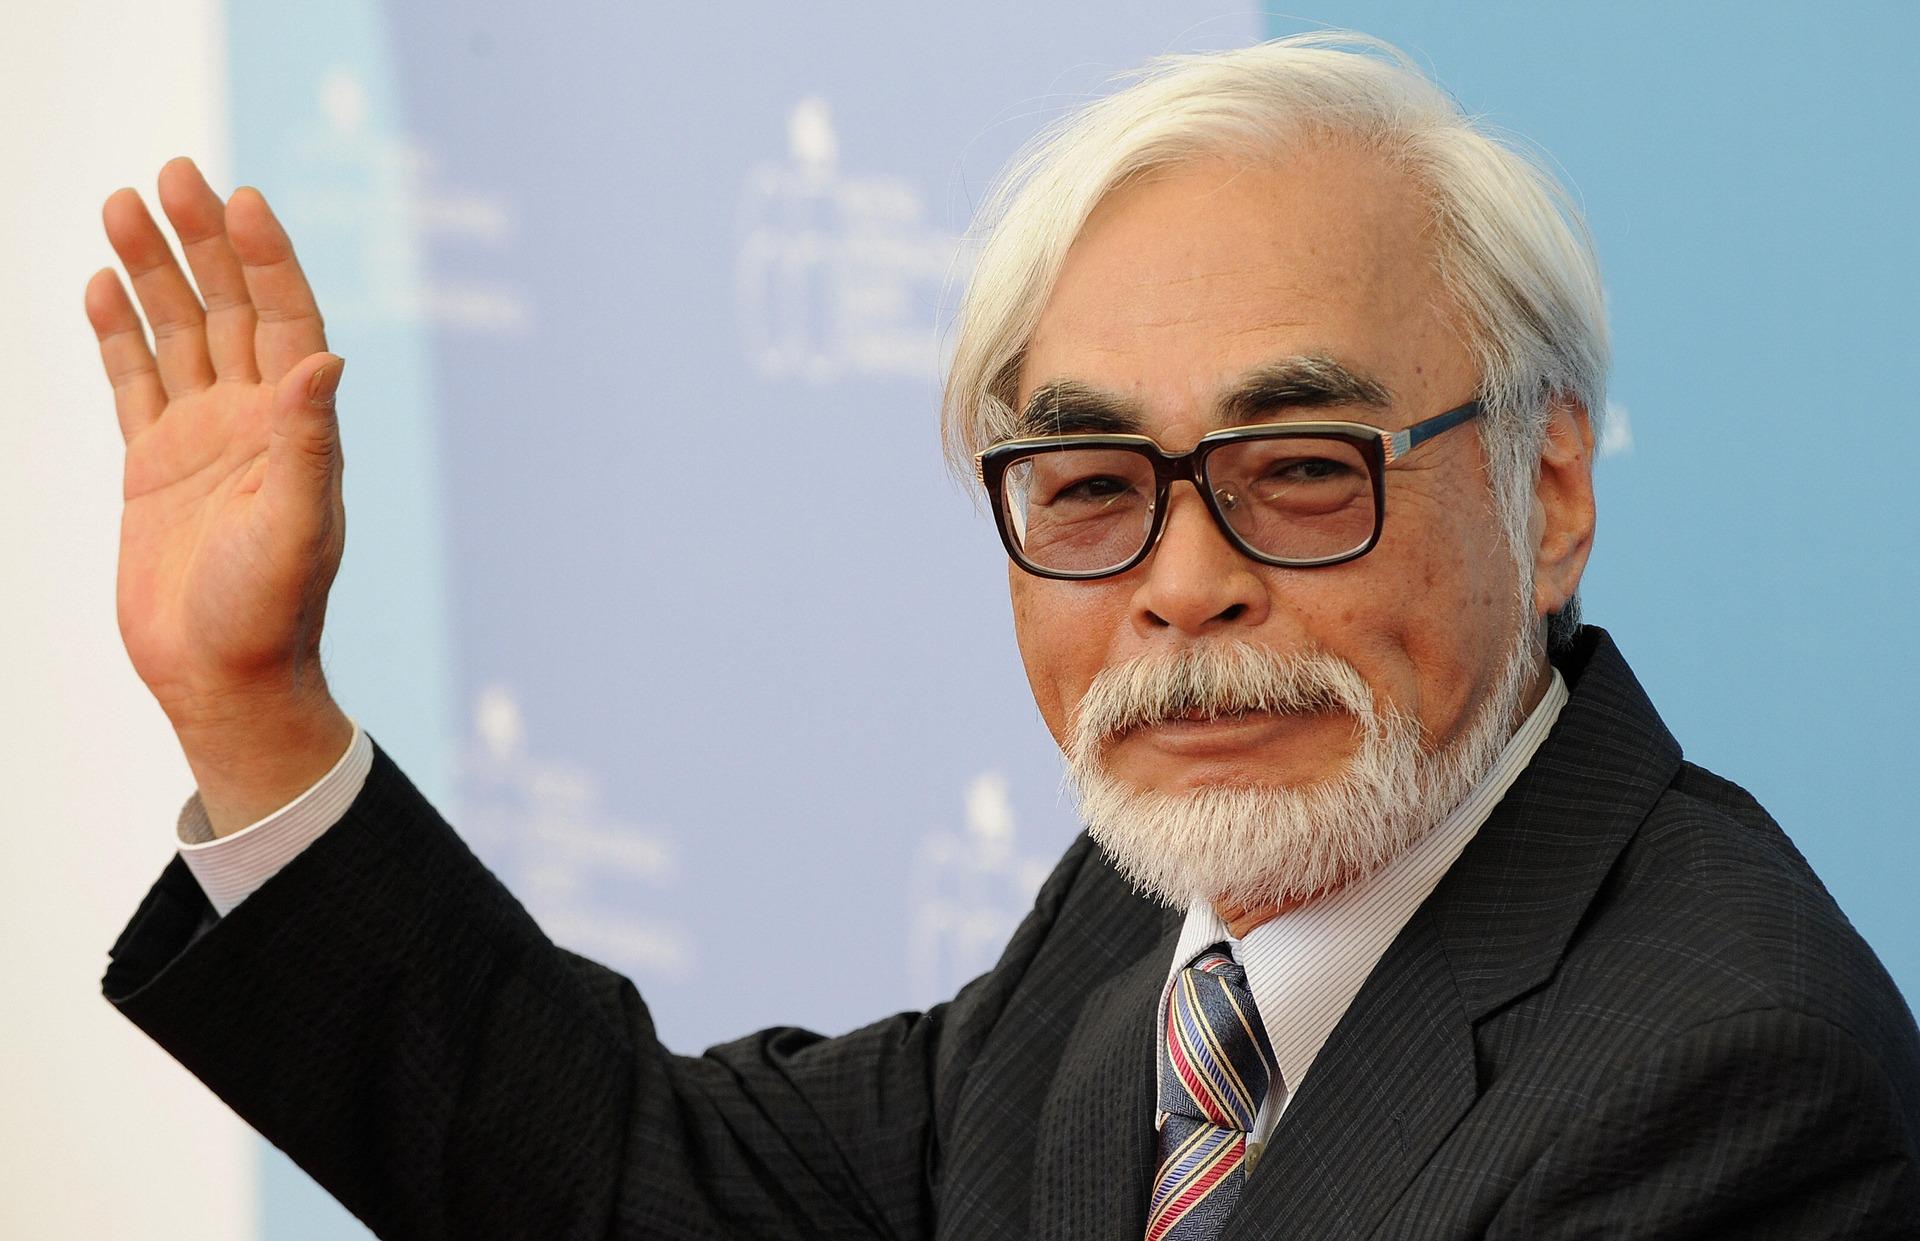 Hayao Miyazaki out of retirement for 'boro the caterpillar'